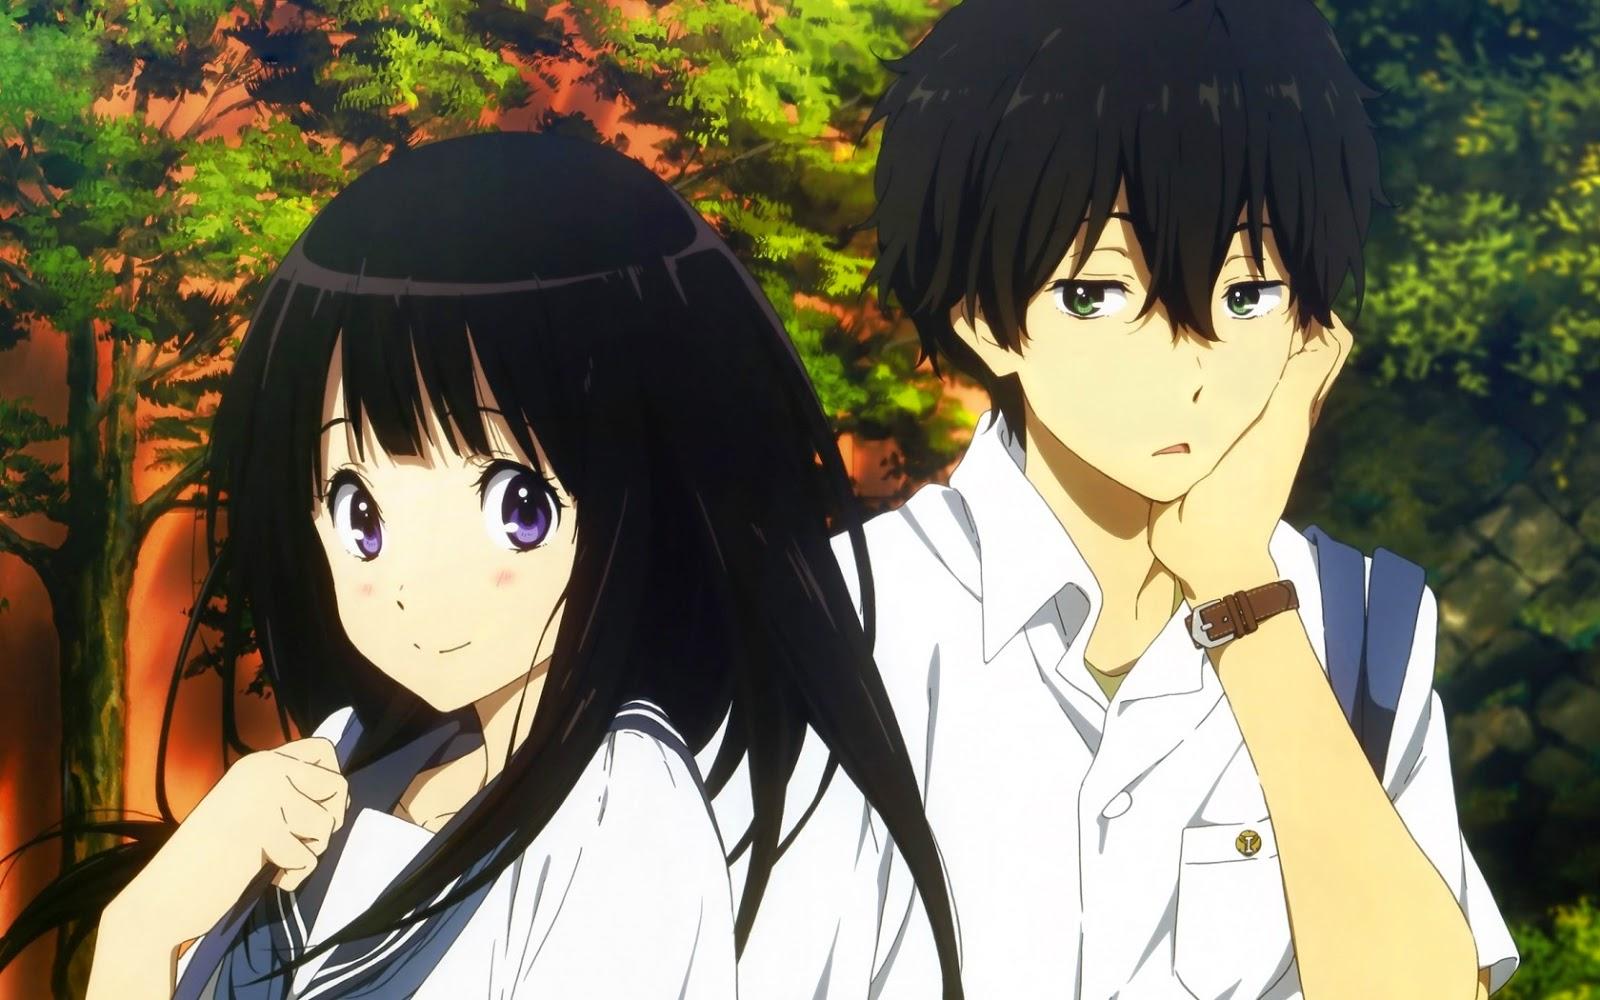 Gambar Pasangan Romantis Anime